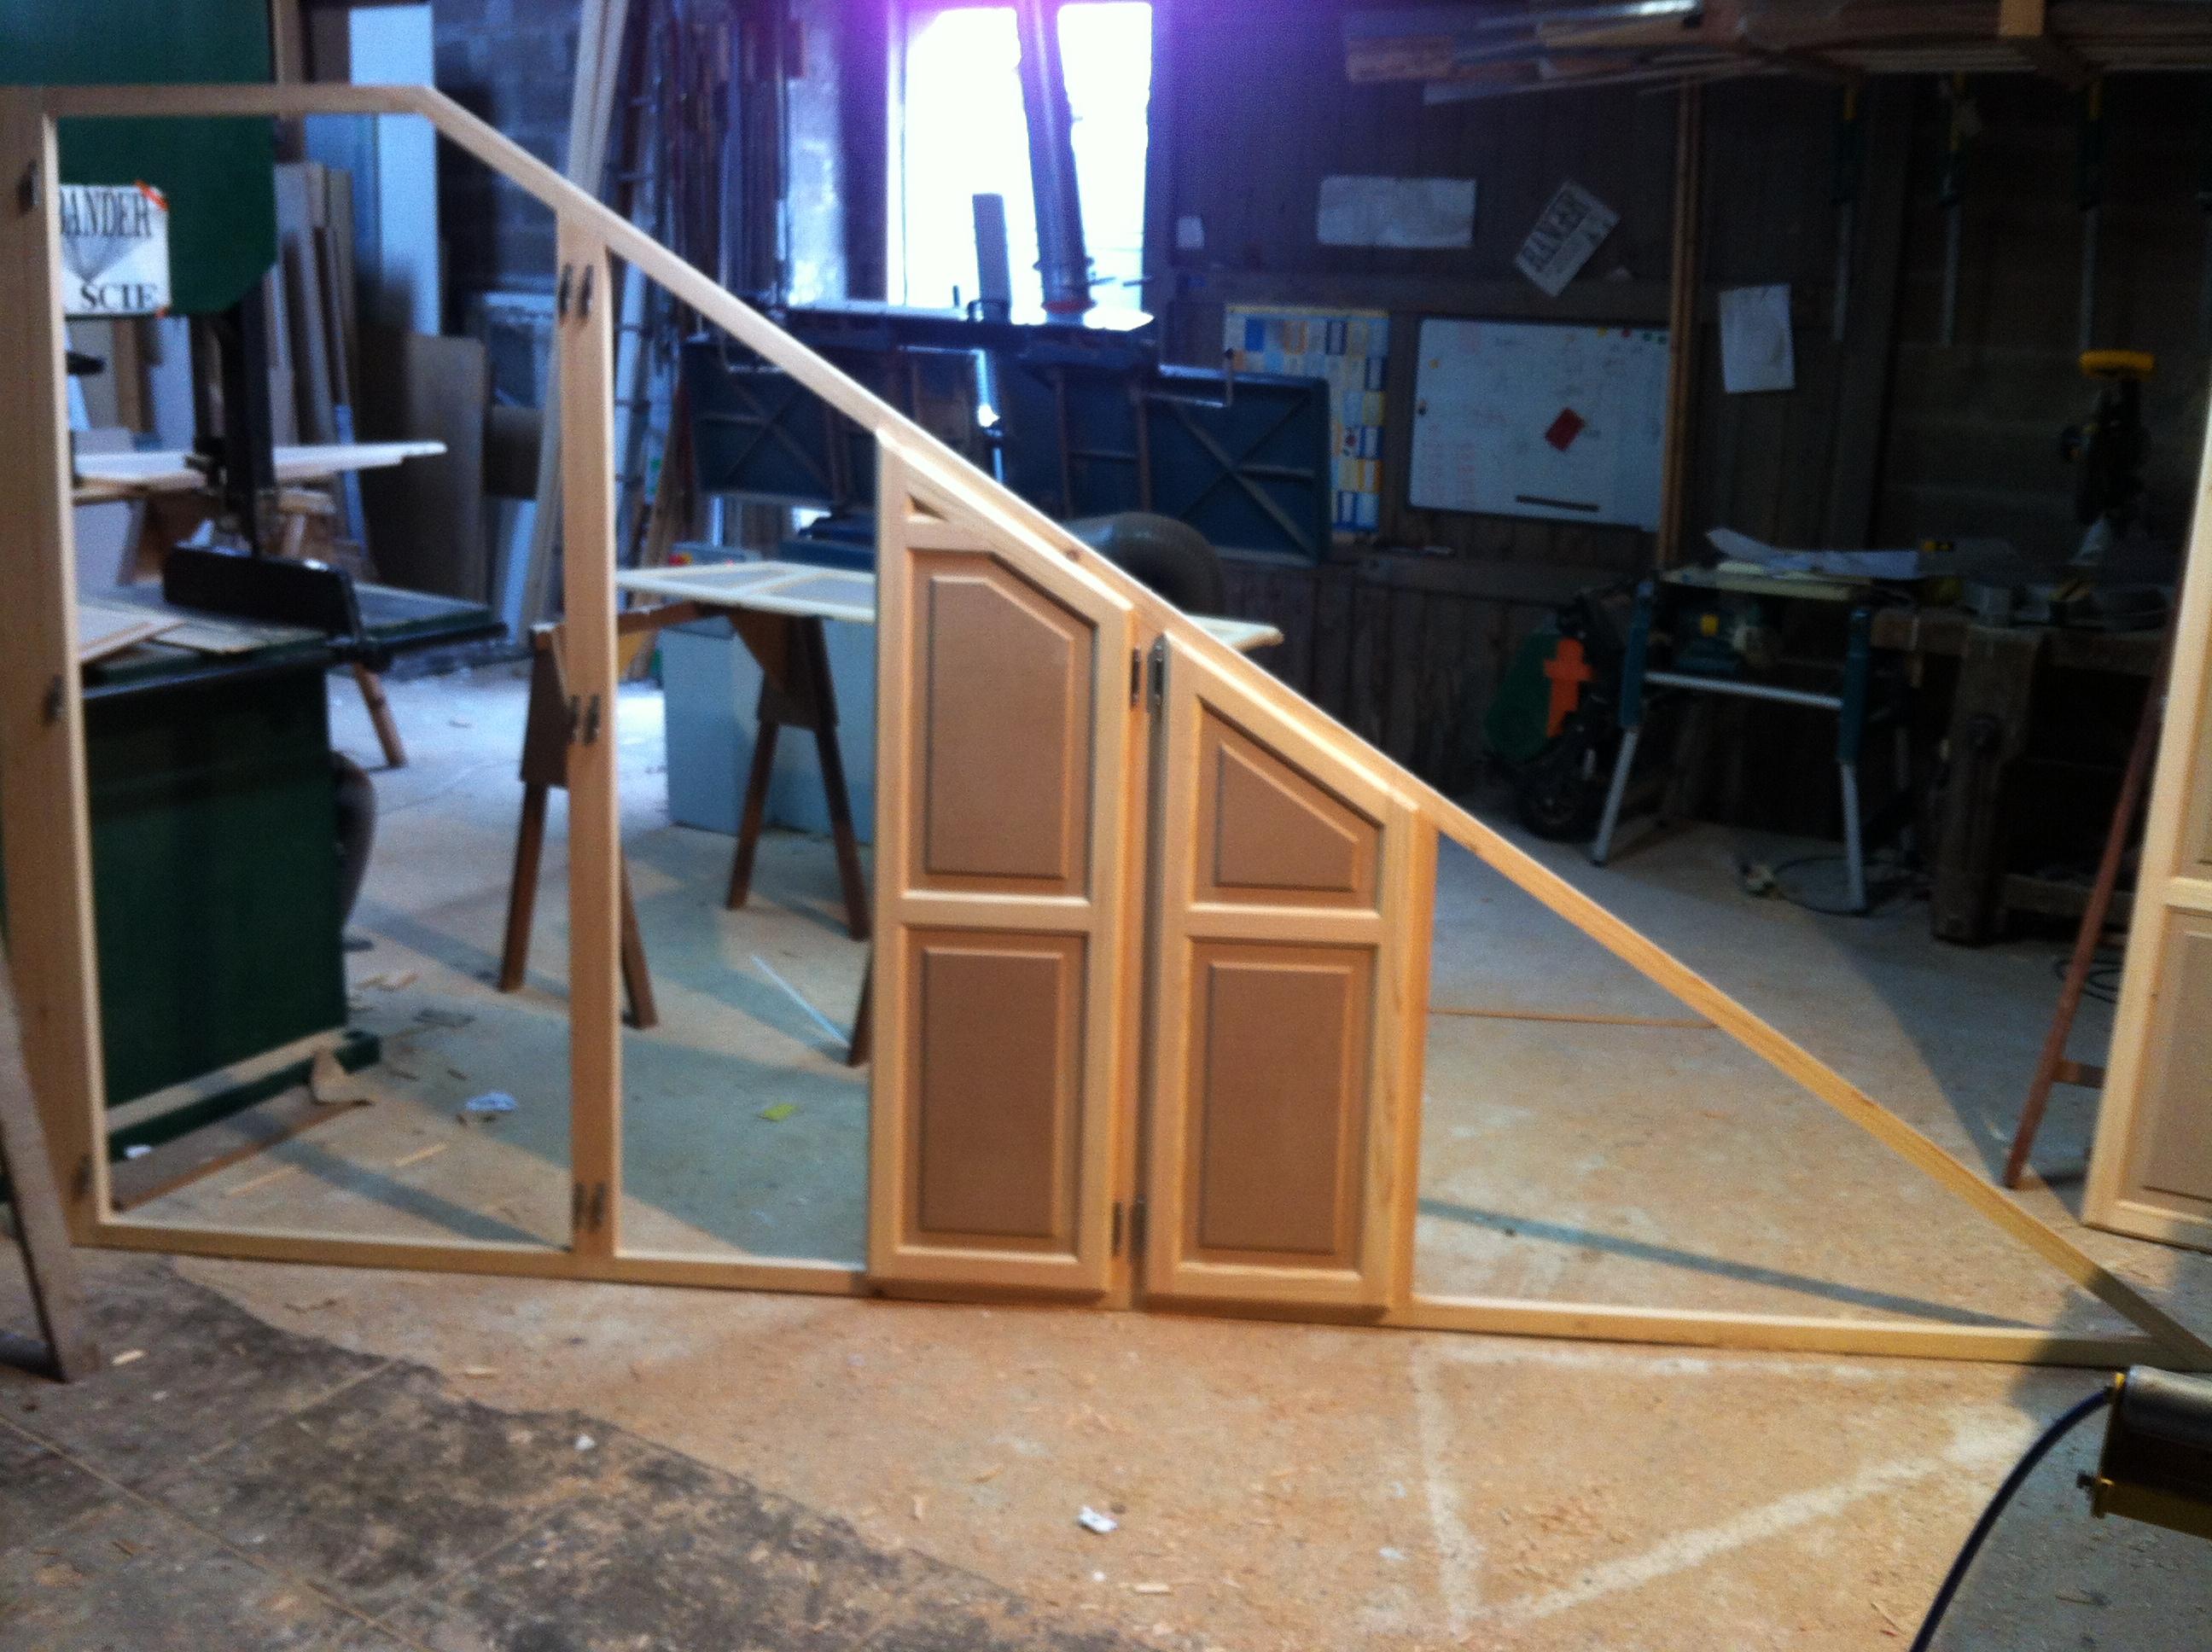 menuiserie bois sur mesure. Black Bedroom Furniture Sets. Home Design Ideas